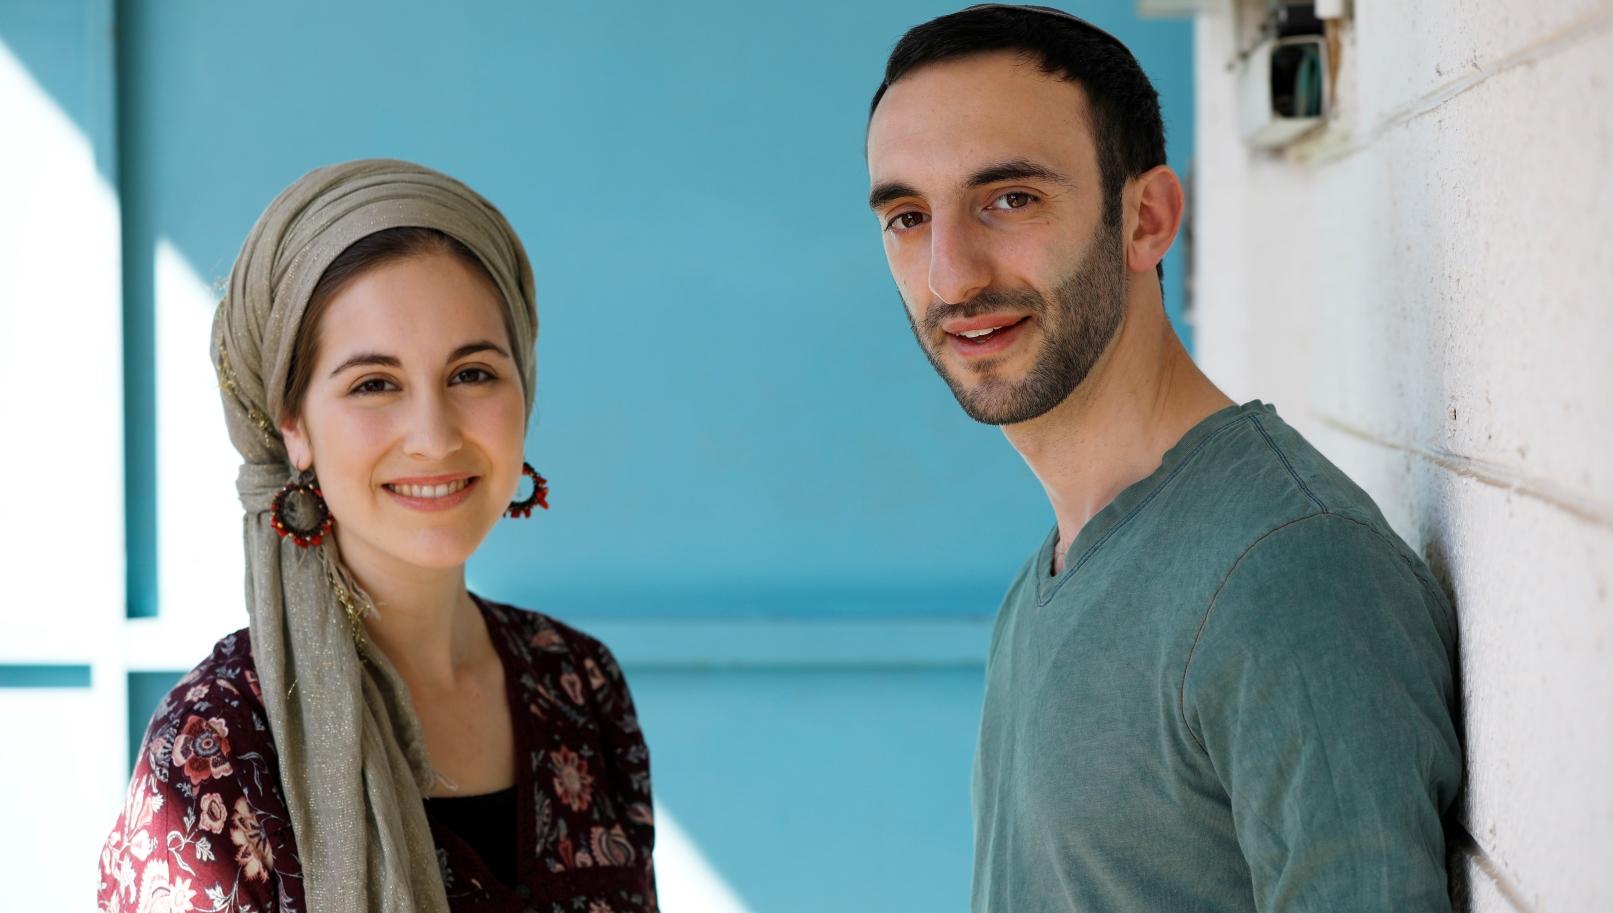 American dating in israel